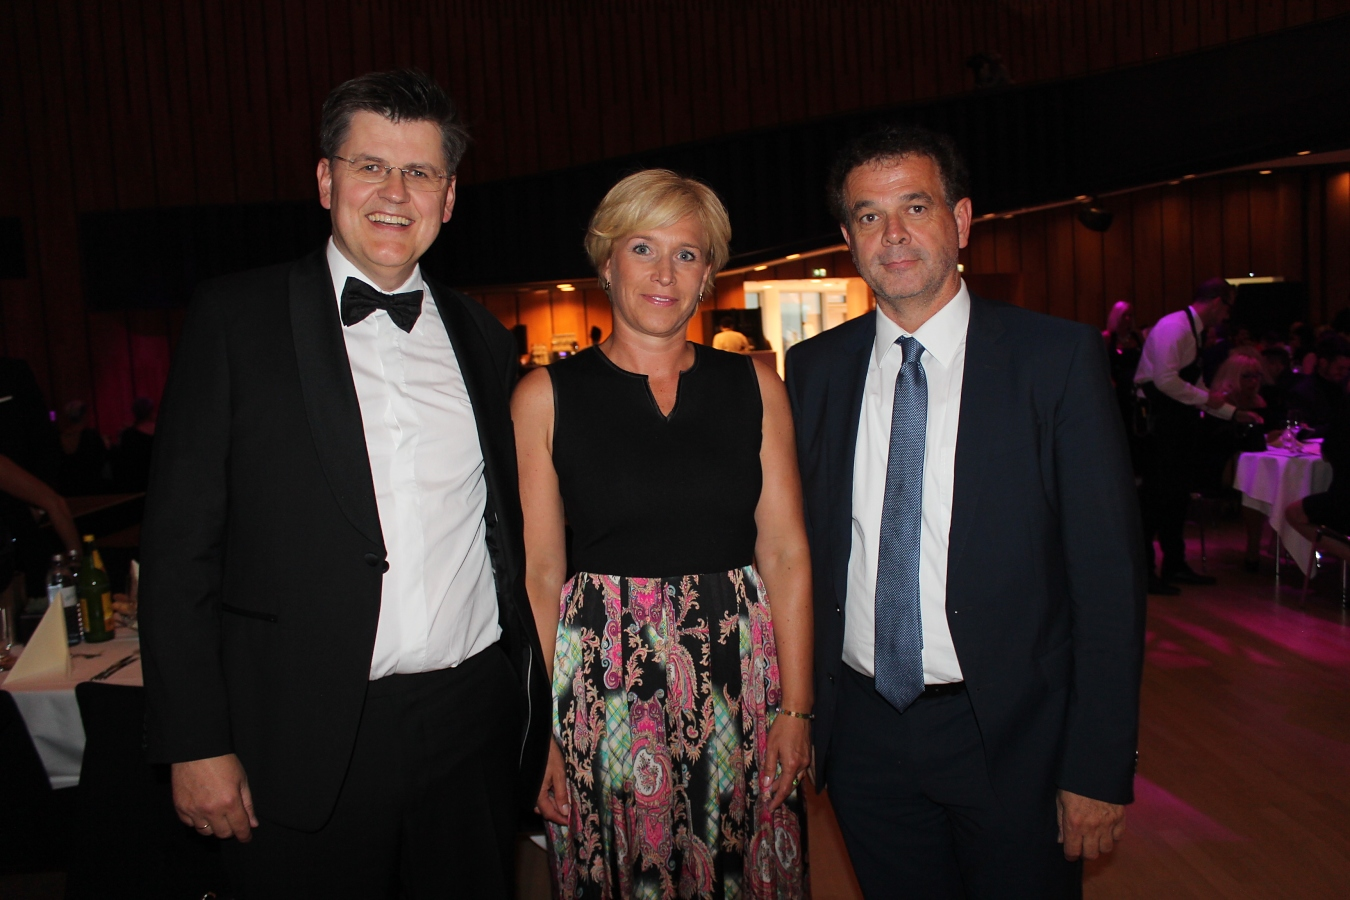 Bernhard und Martina Feigl mit Christoph Jenny